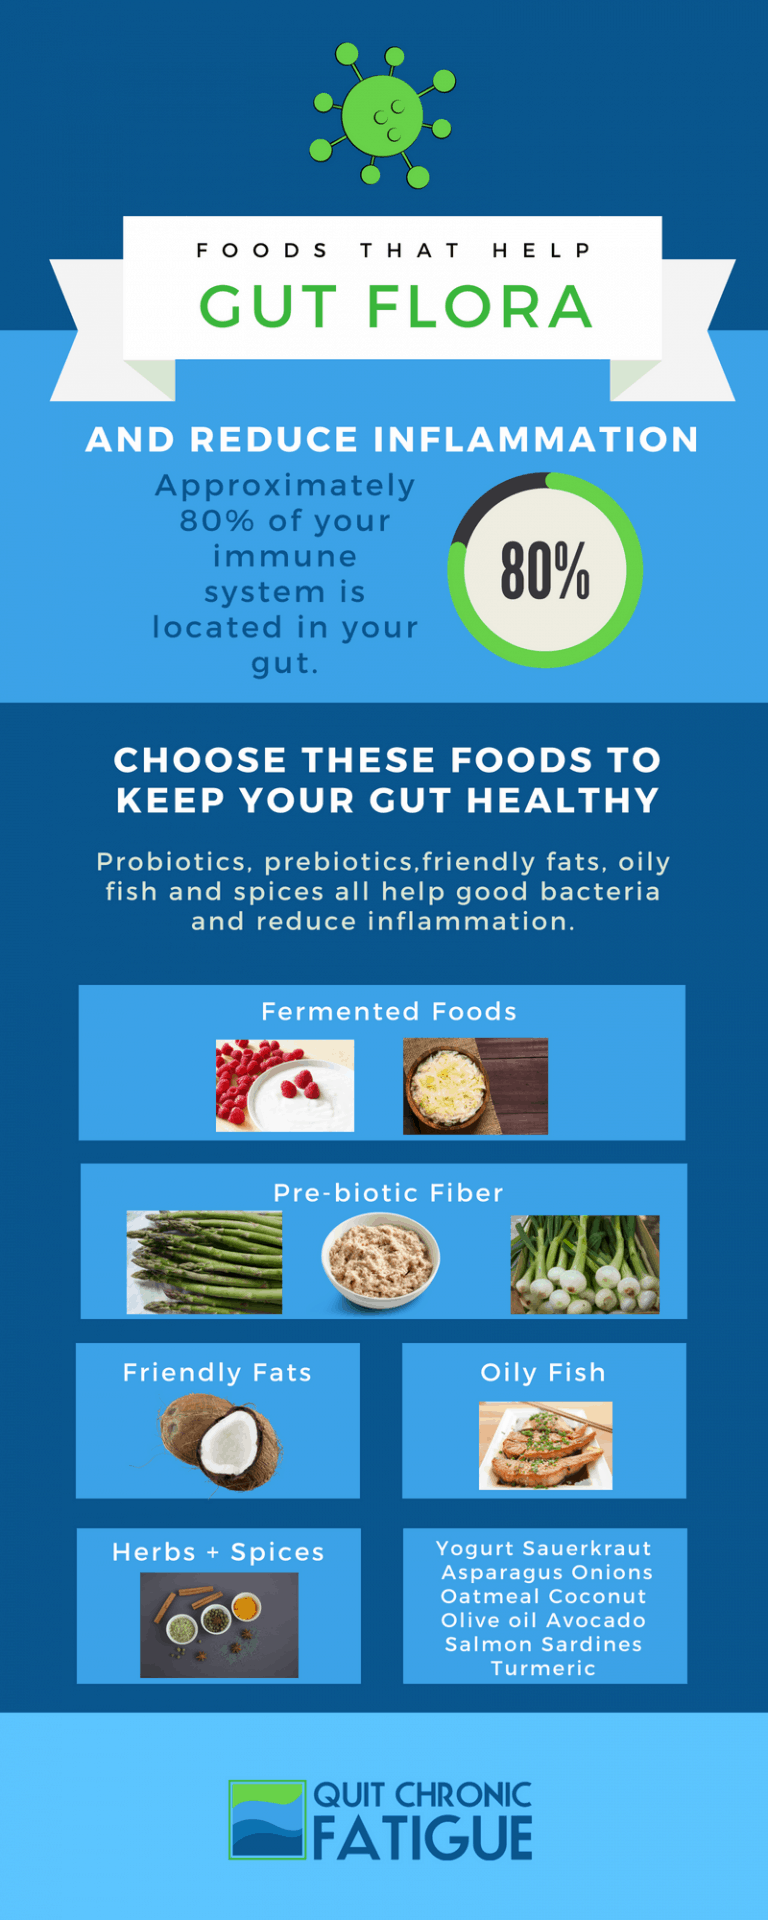 Foods that help gut flora